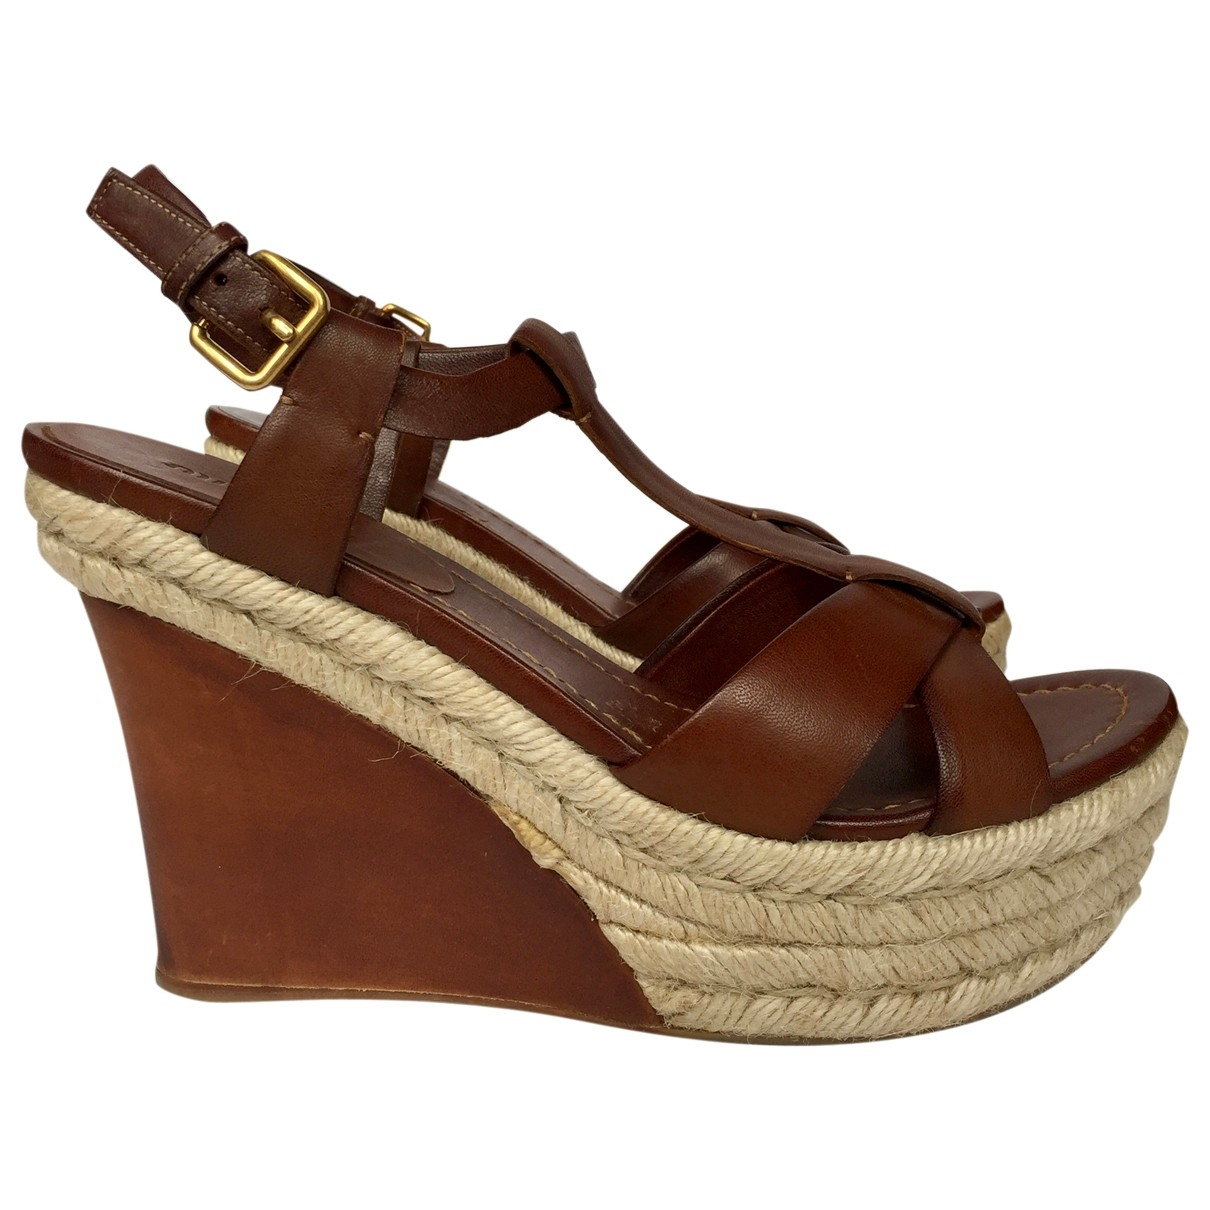 Miu Miu \N Brown Leather Sandals for Women 38.5 IT